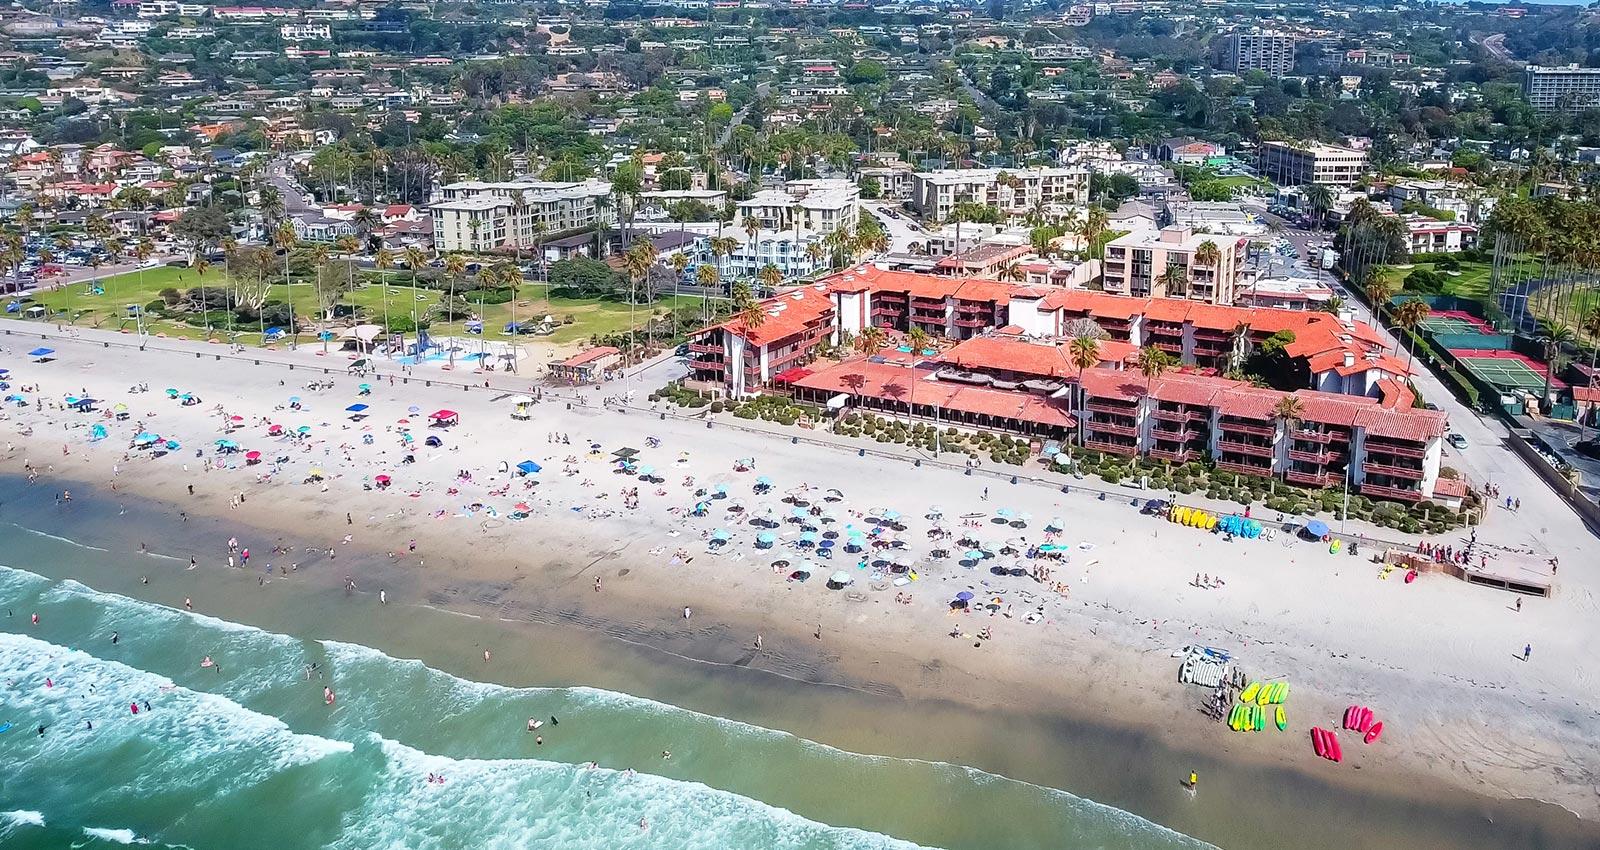 Best Kitchen Gallery: A Beachfront La Jolla Hotel La Jolla Shores Hotel of La Jolla Beach Hotels And Resorts  on rachelxblog.com